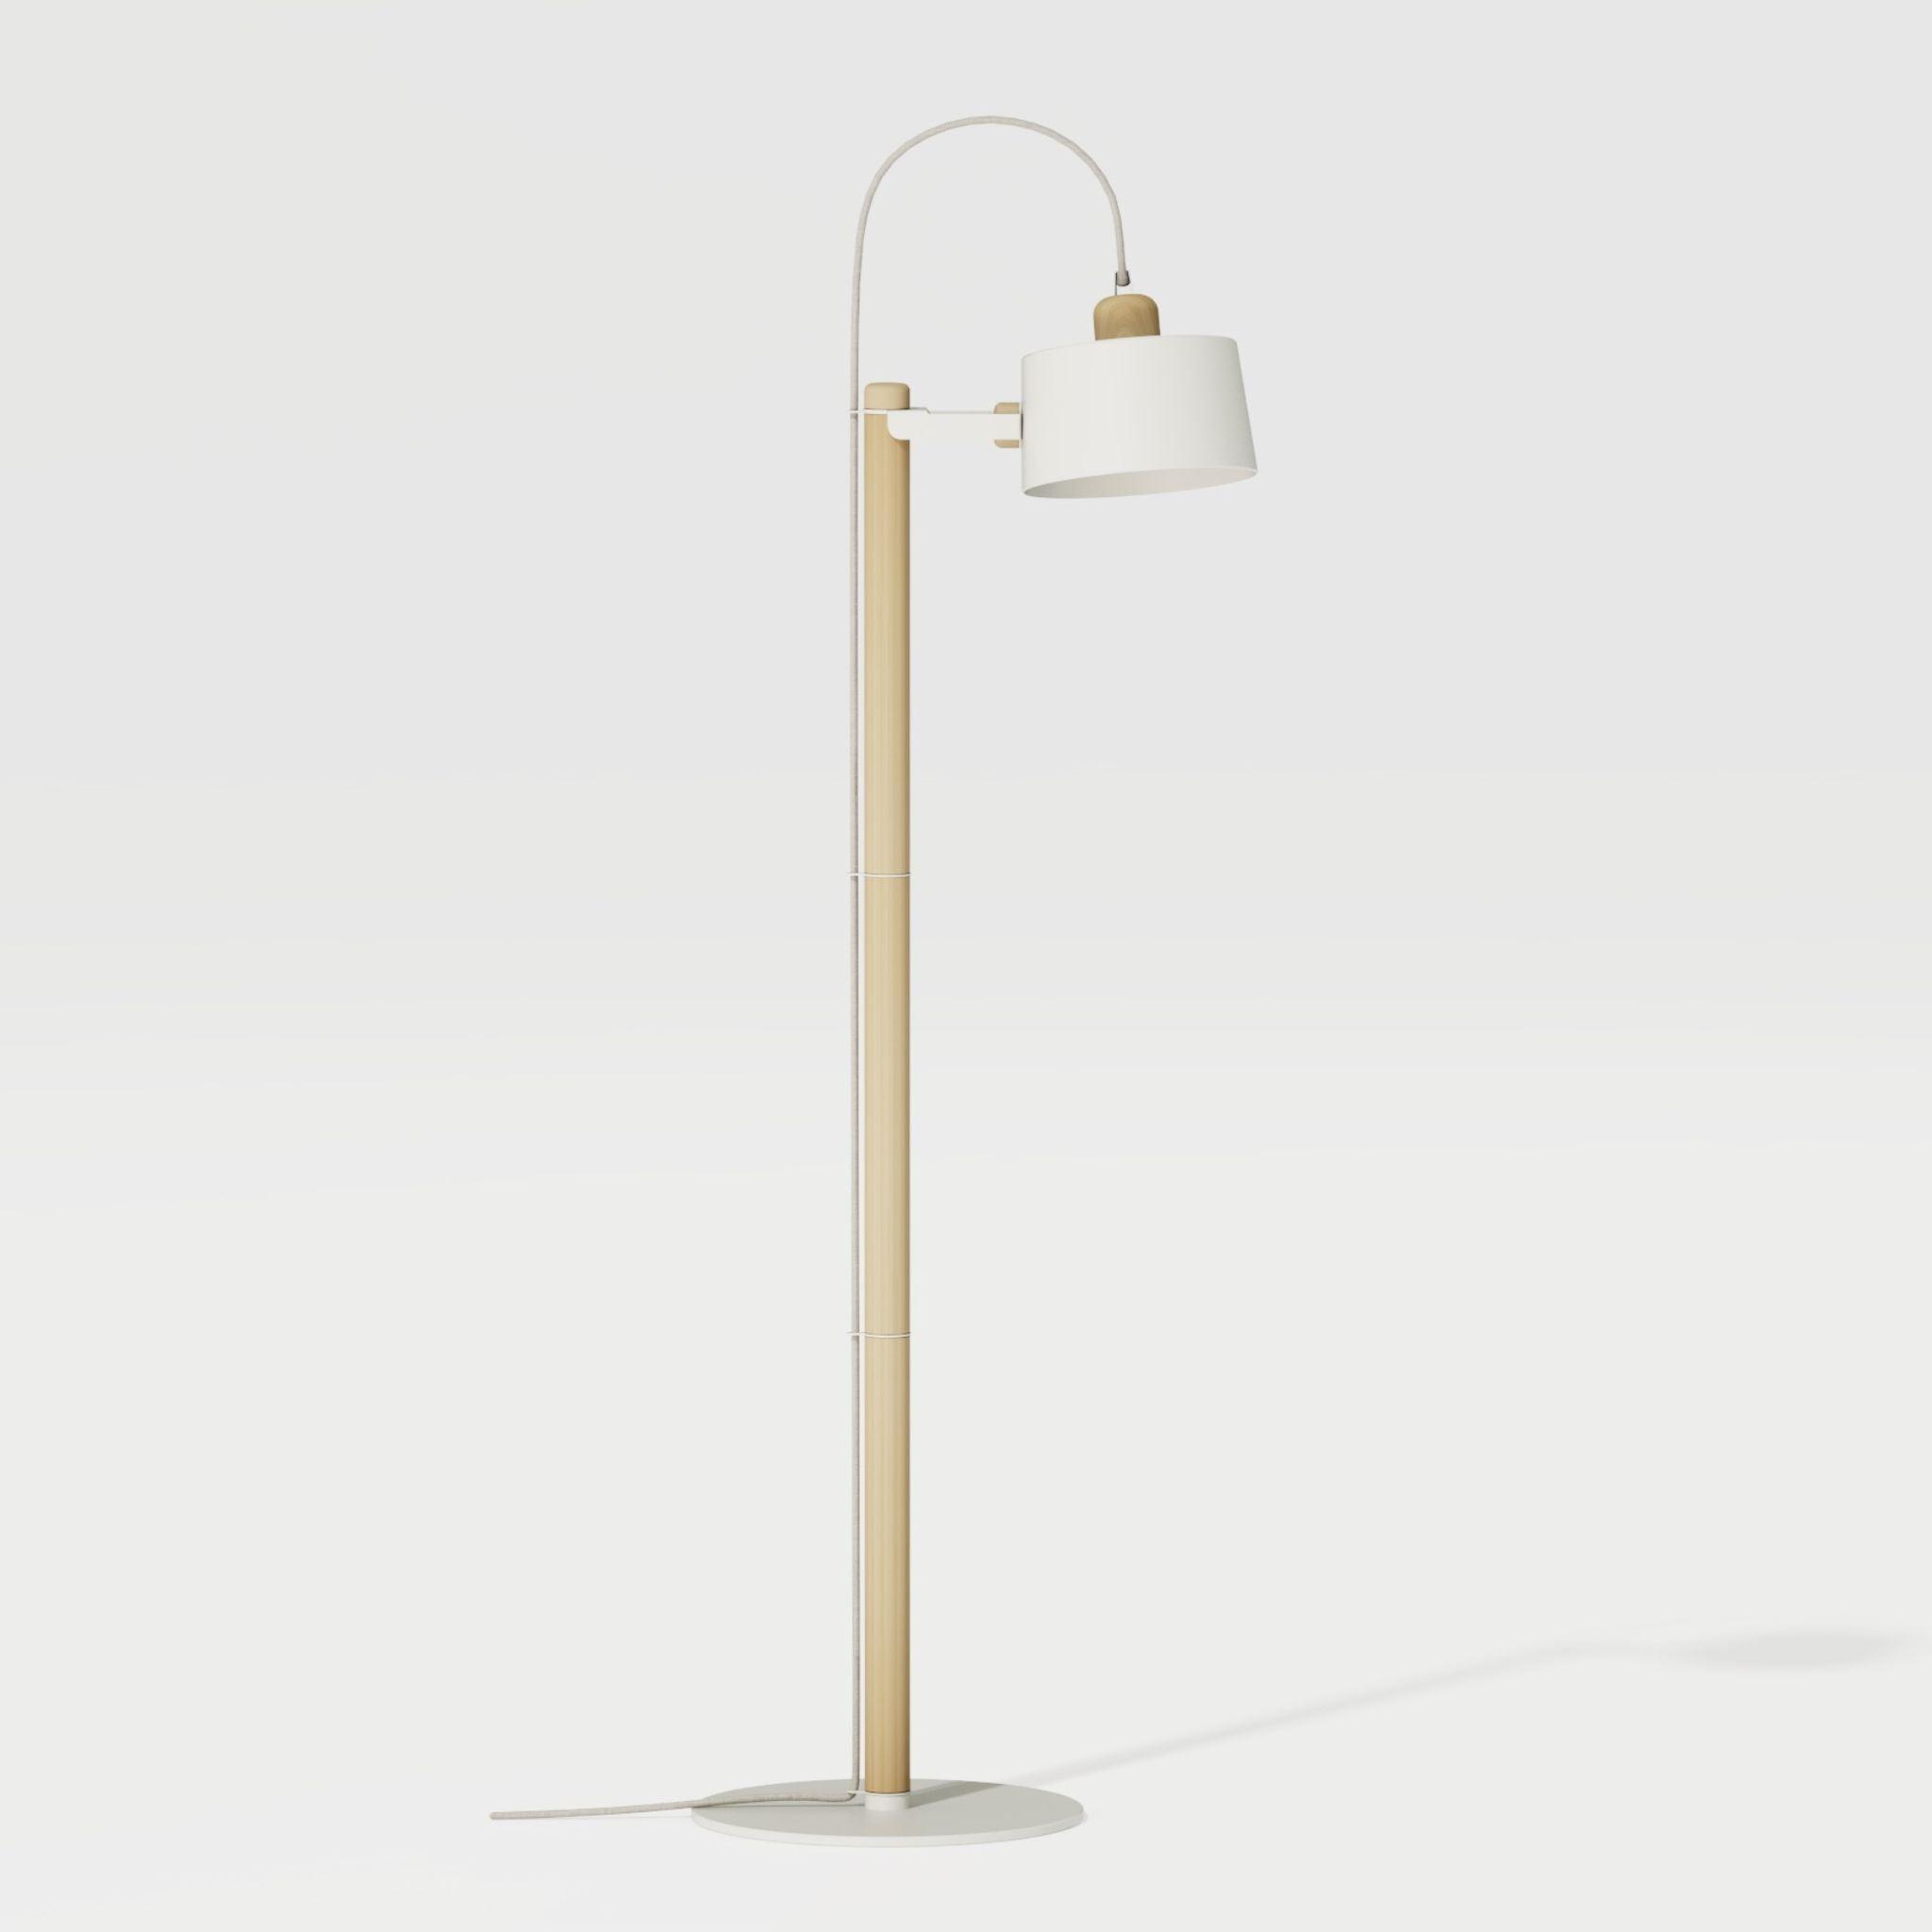 Luminaire à poser chêne et métal blanc